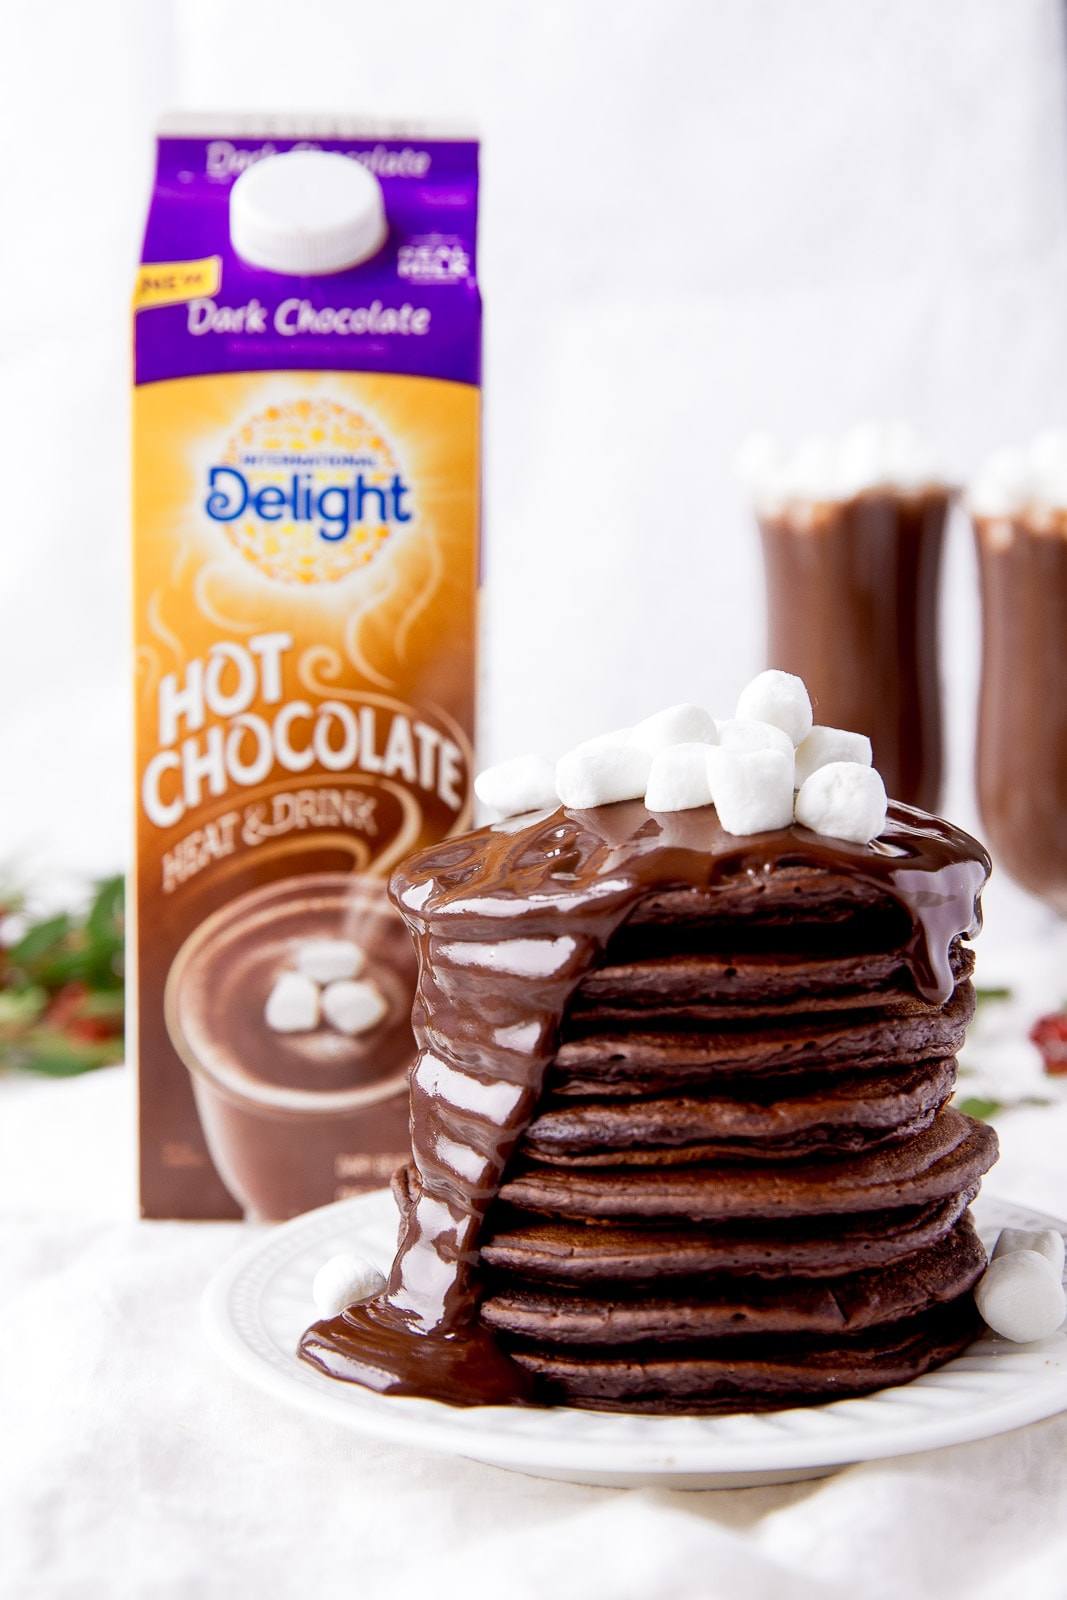 Hot Chocolate Pancakes with fudge sauce